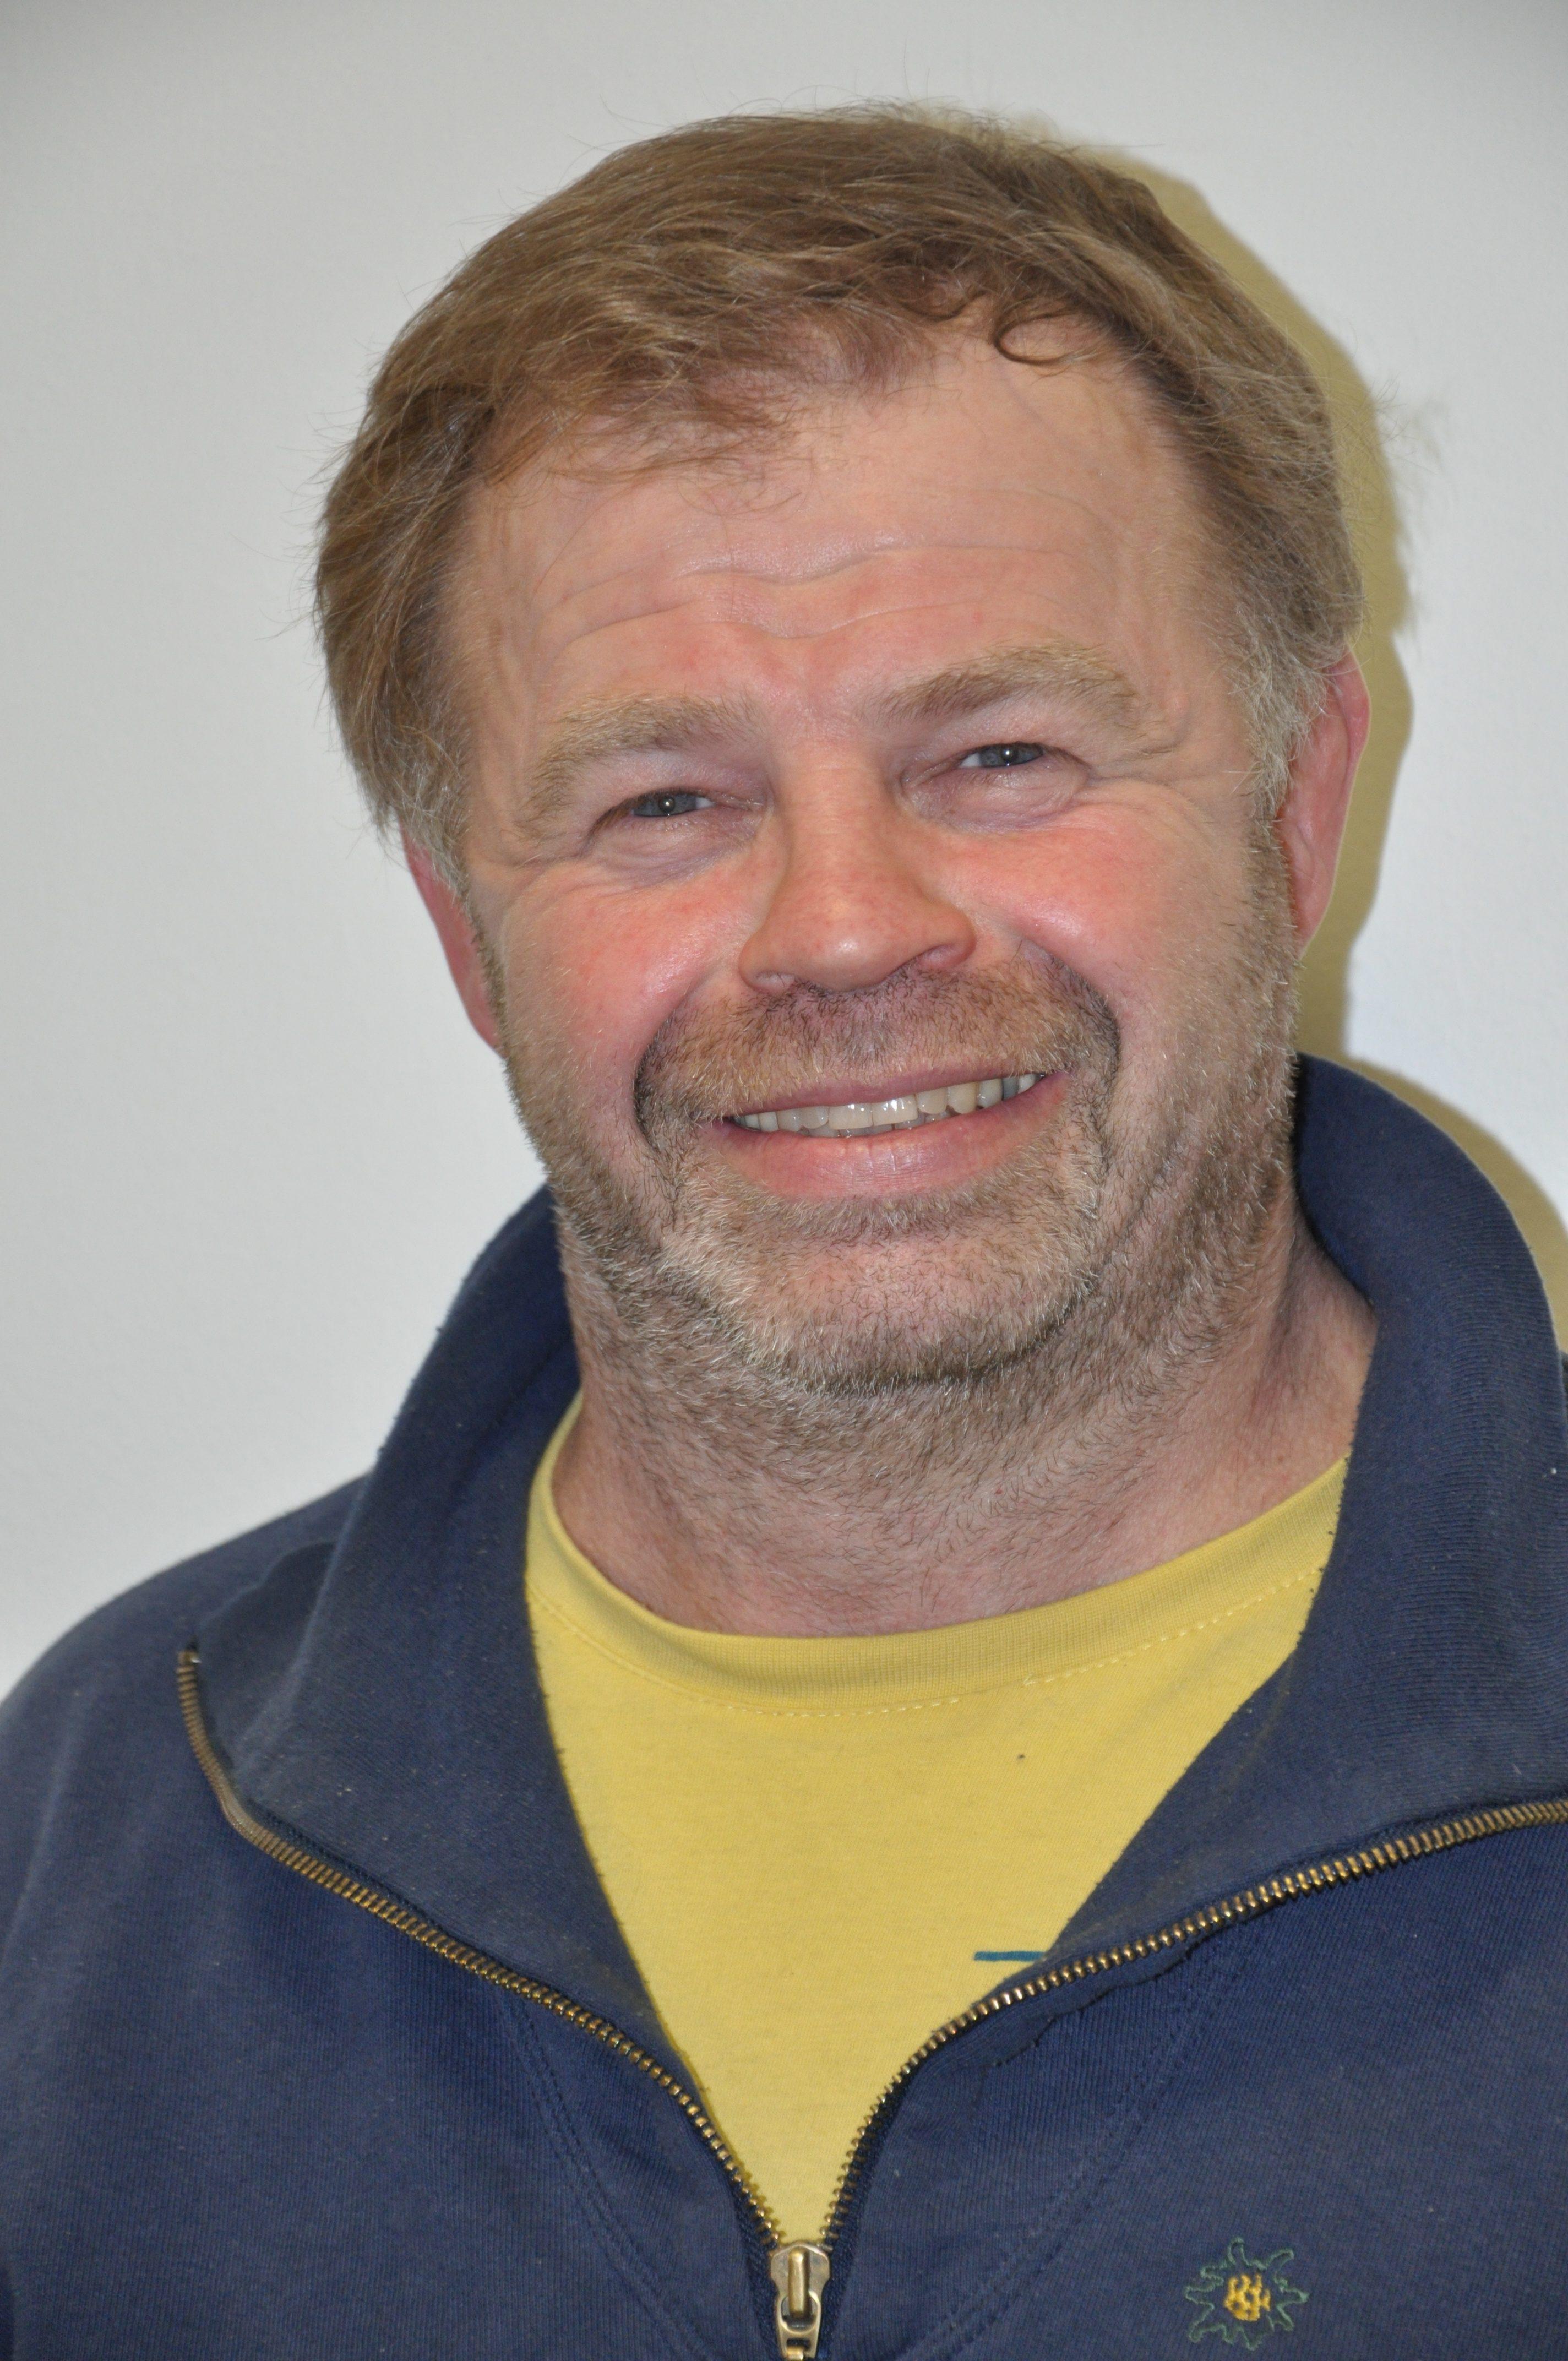 Manfred Dullinger